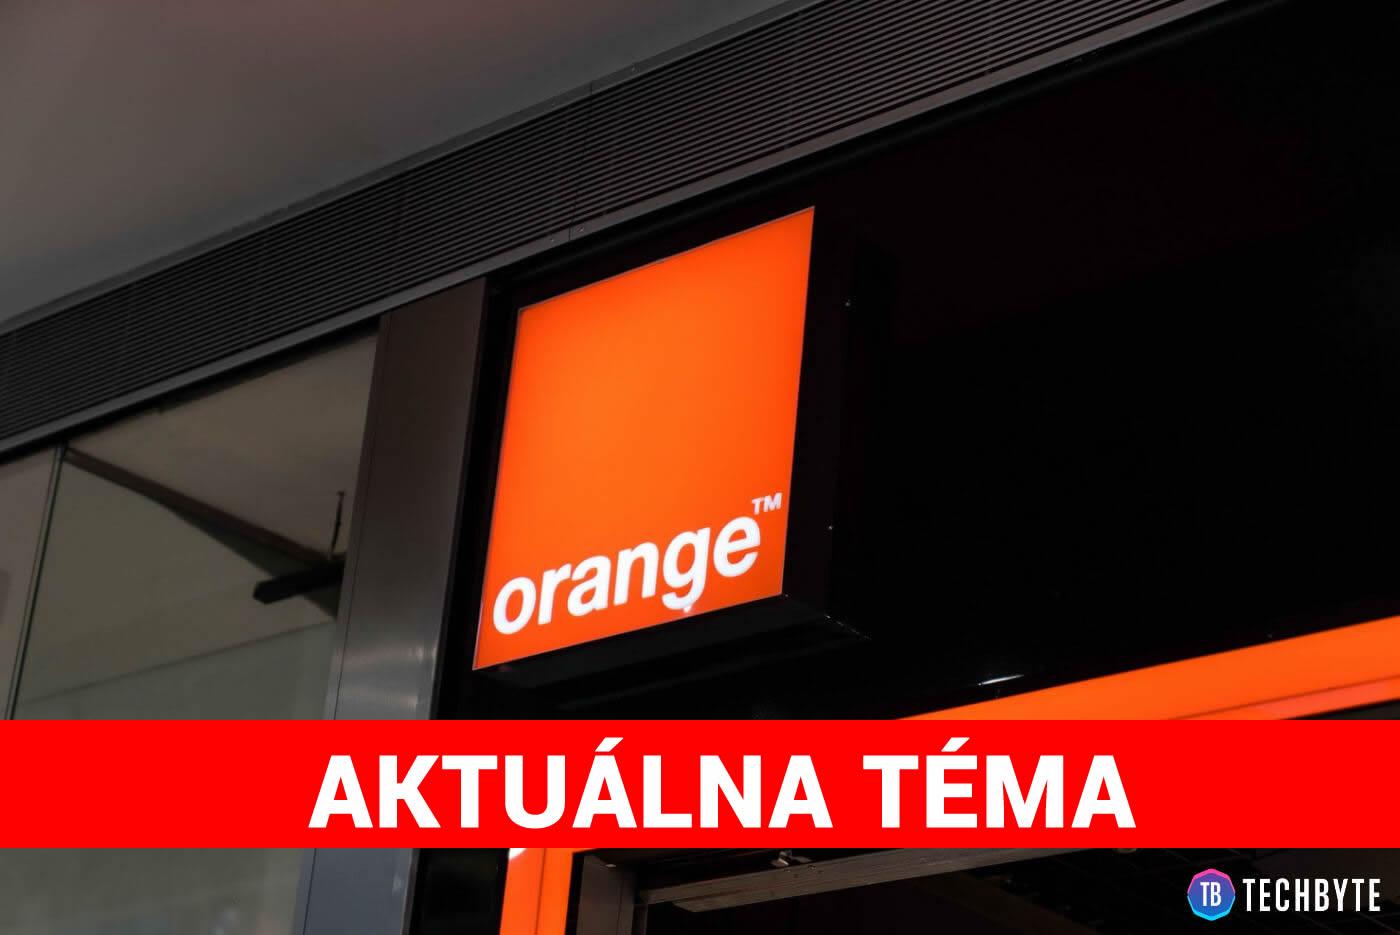 orange aktualne